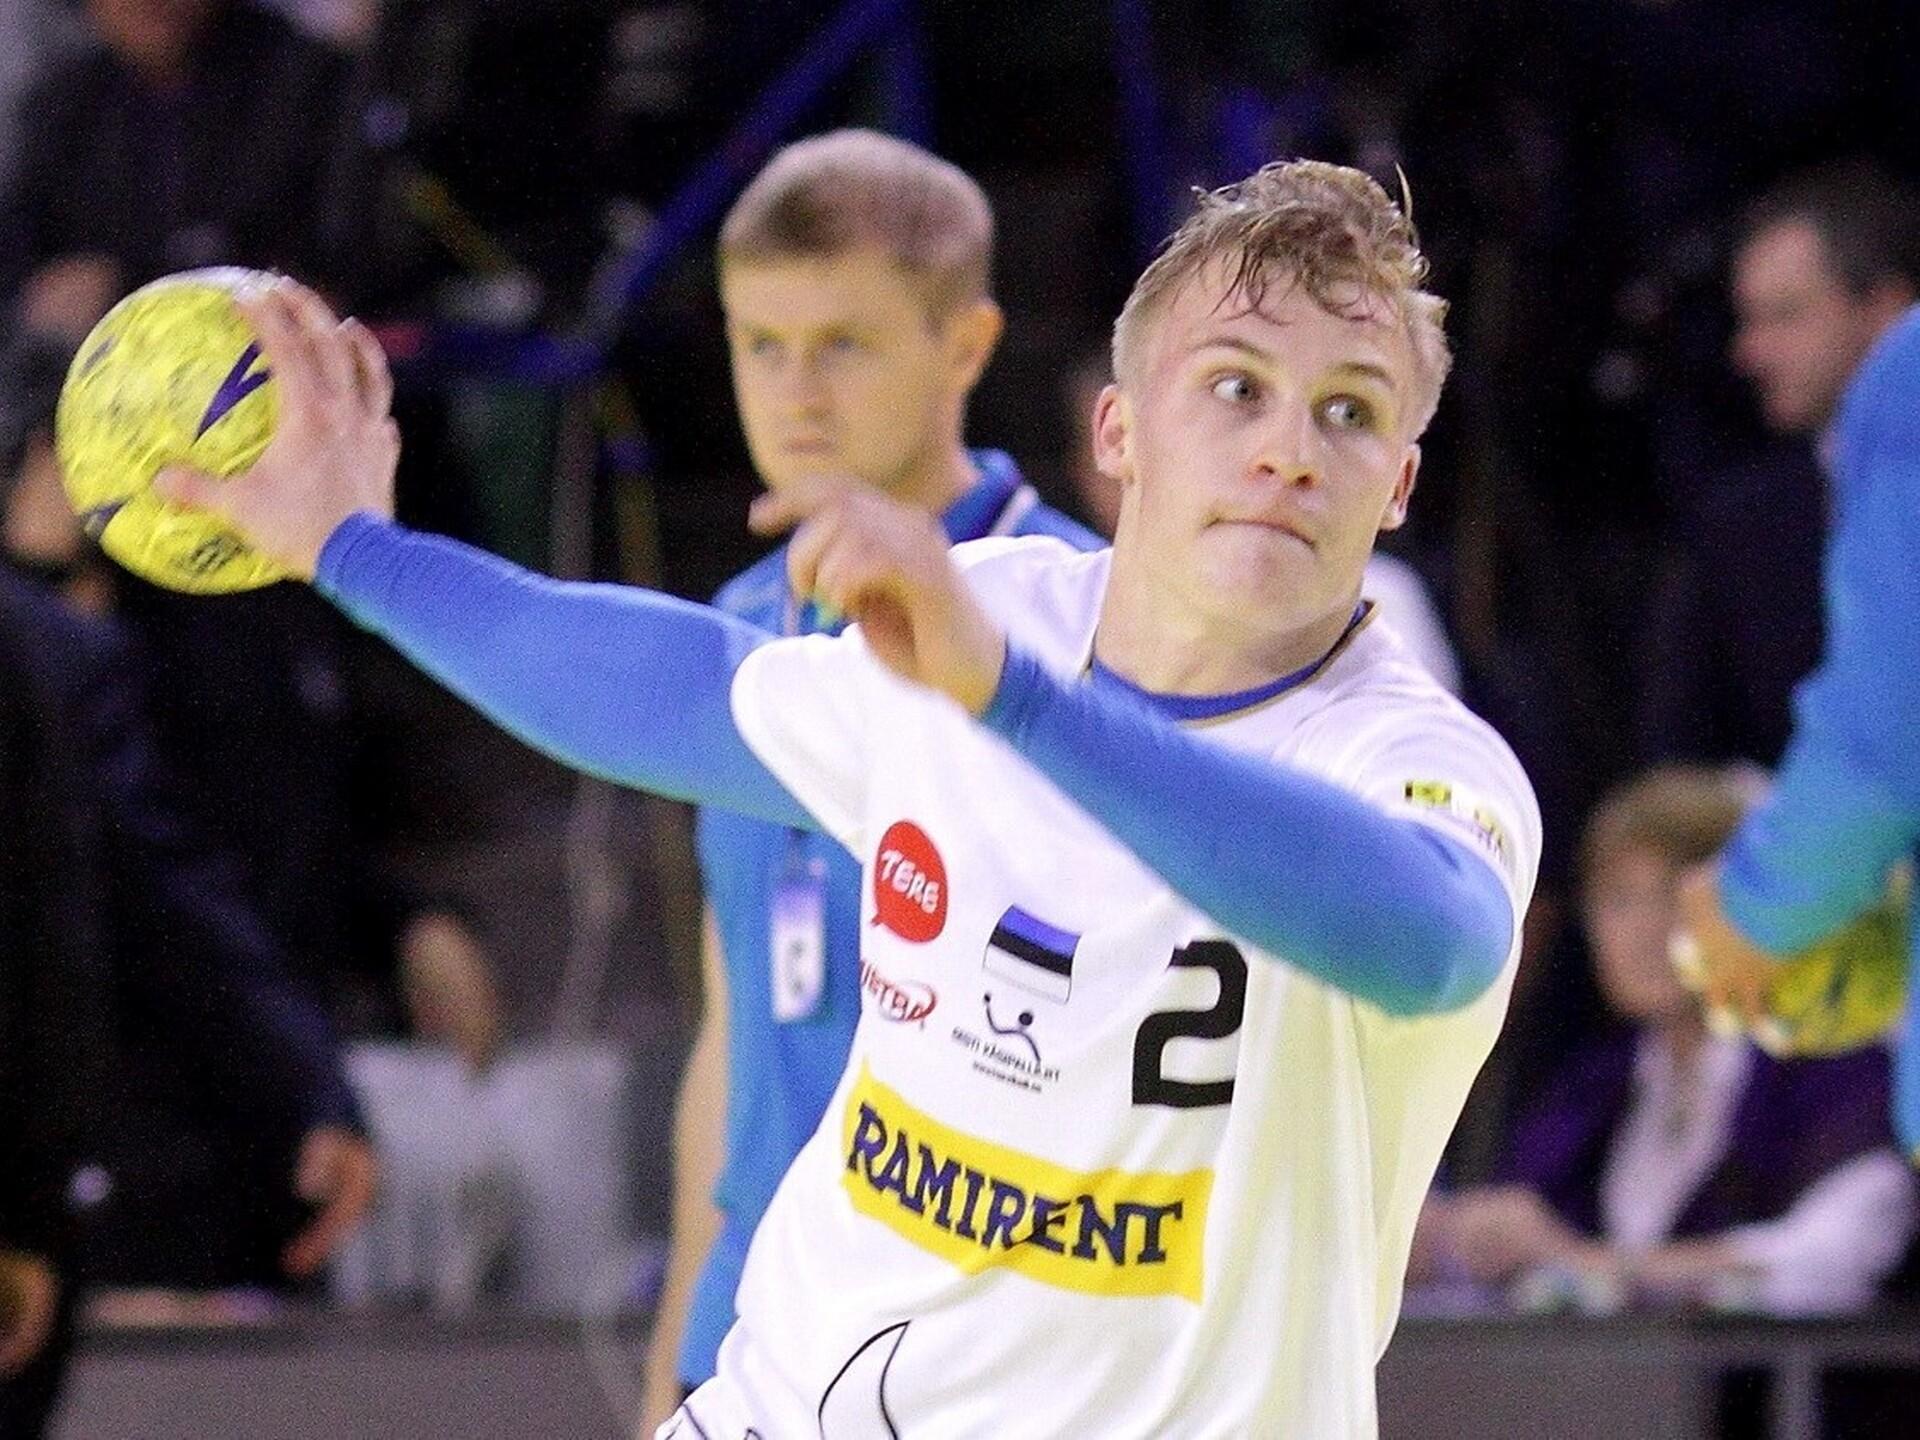 2179a8e80ad Käsipallurid välismaal: Pinnonenile Islandil hõbe, Celminšil Sloveenias  pronks sihikul | Käsipall | ERR